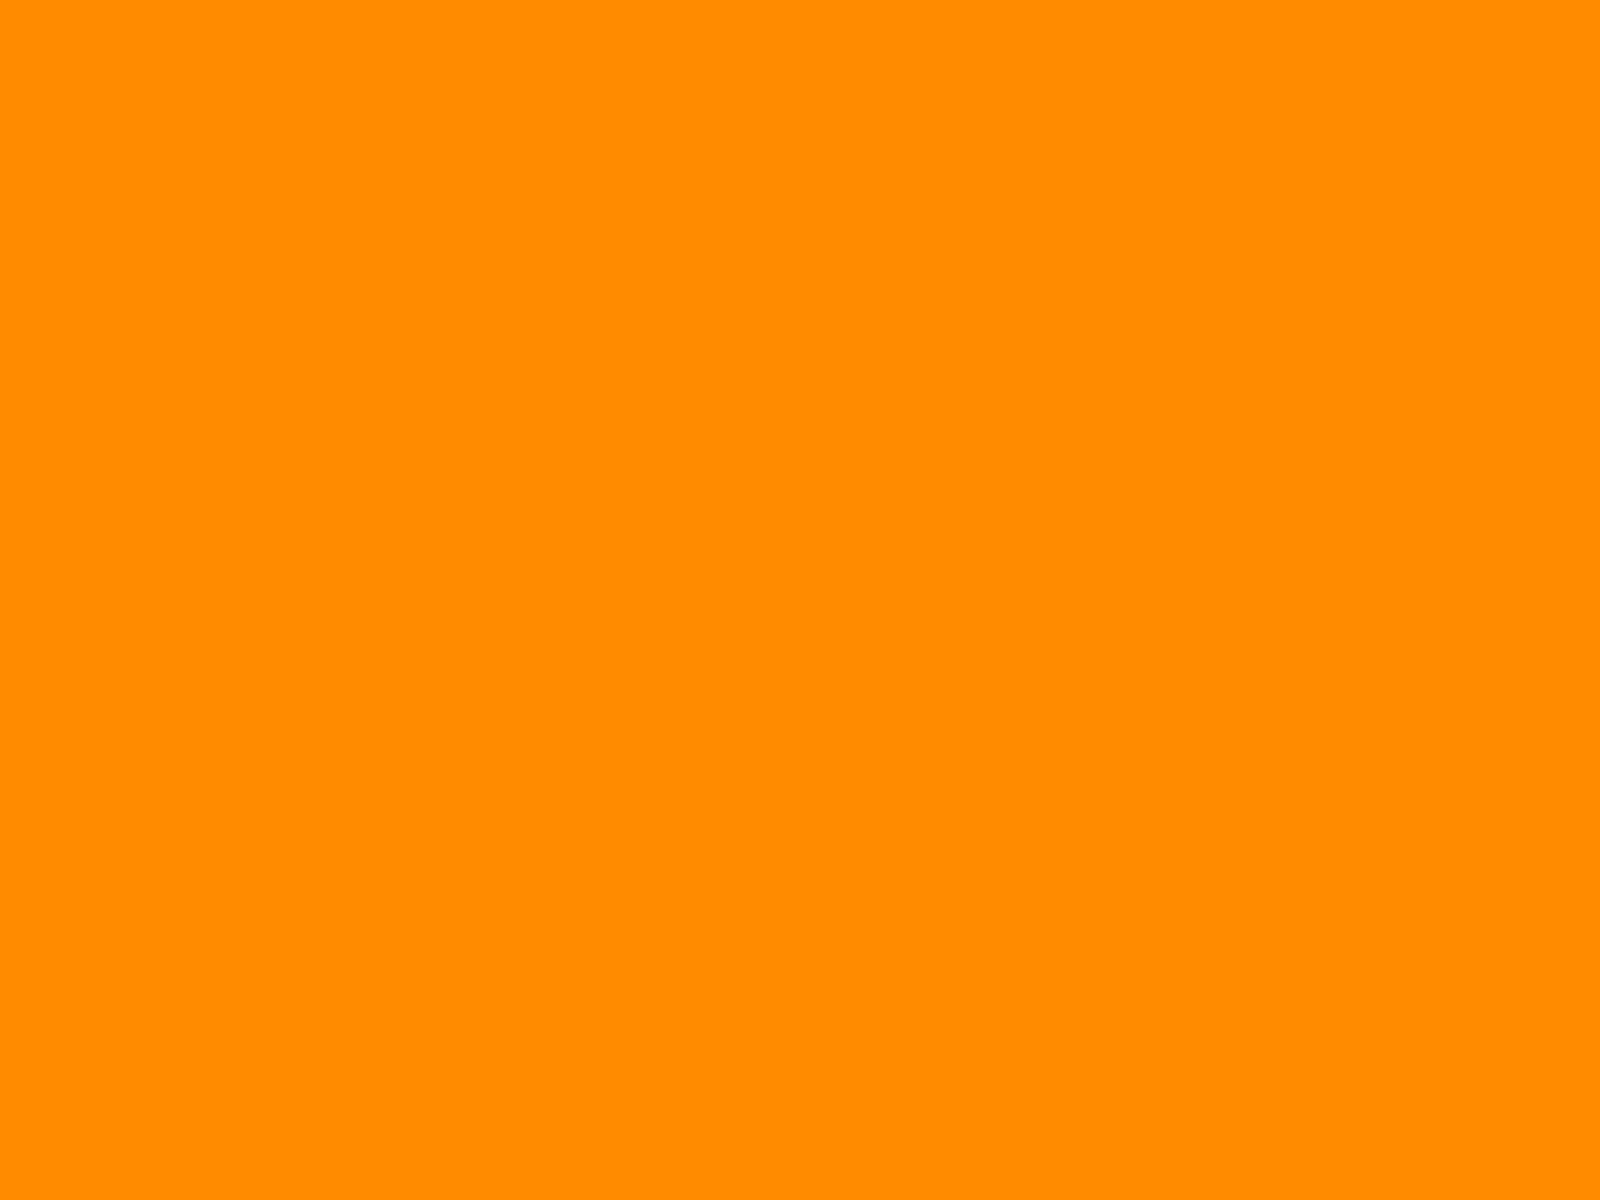 1600x1200 Dark Orange Solid Color Background